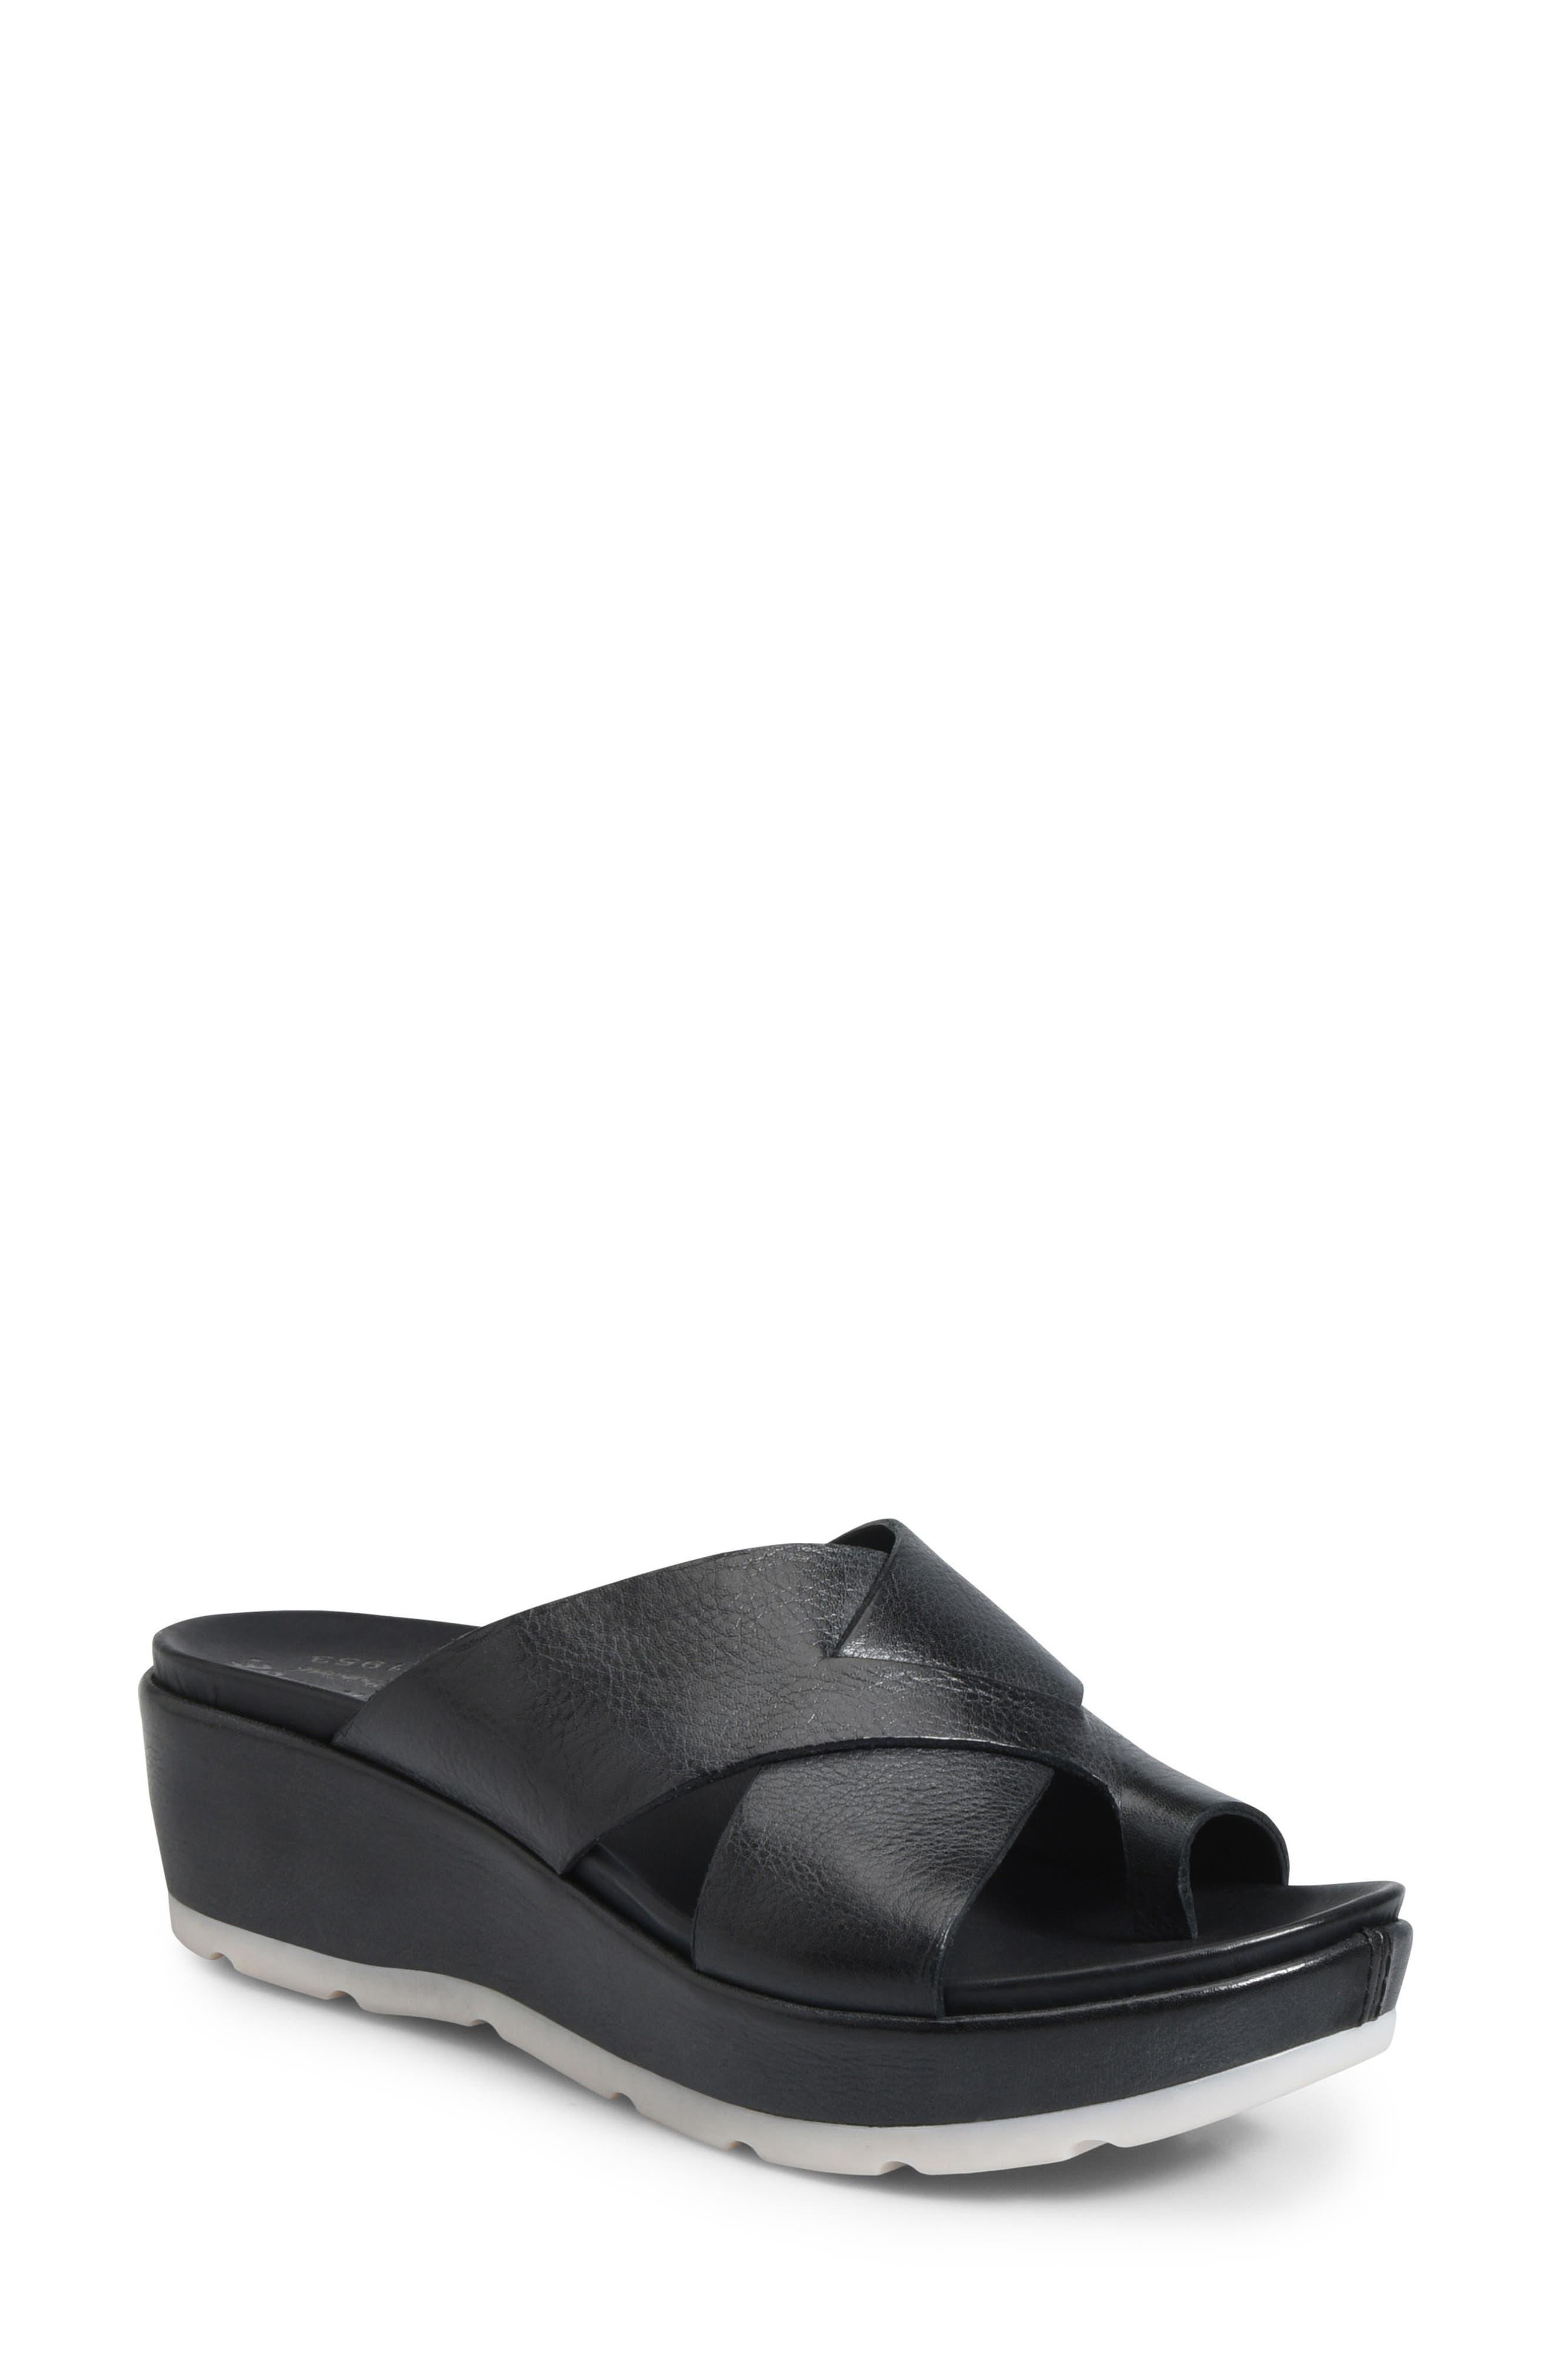 KORK-EASE<SUP>®</SUP>, Baja Sport Slide Sandal, Main thumbnail 1, color, BLACK LEATHER